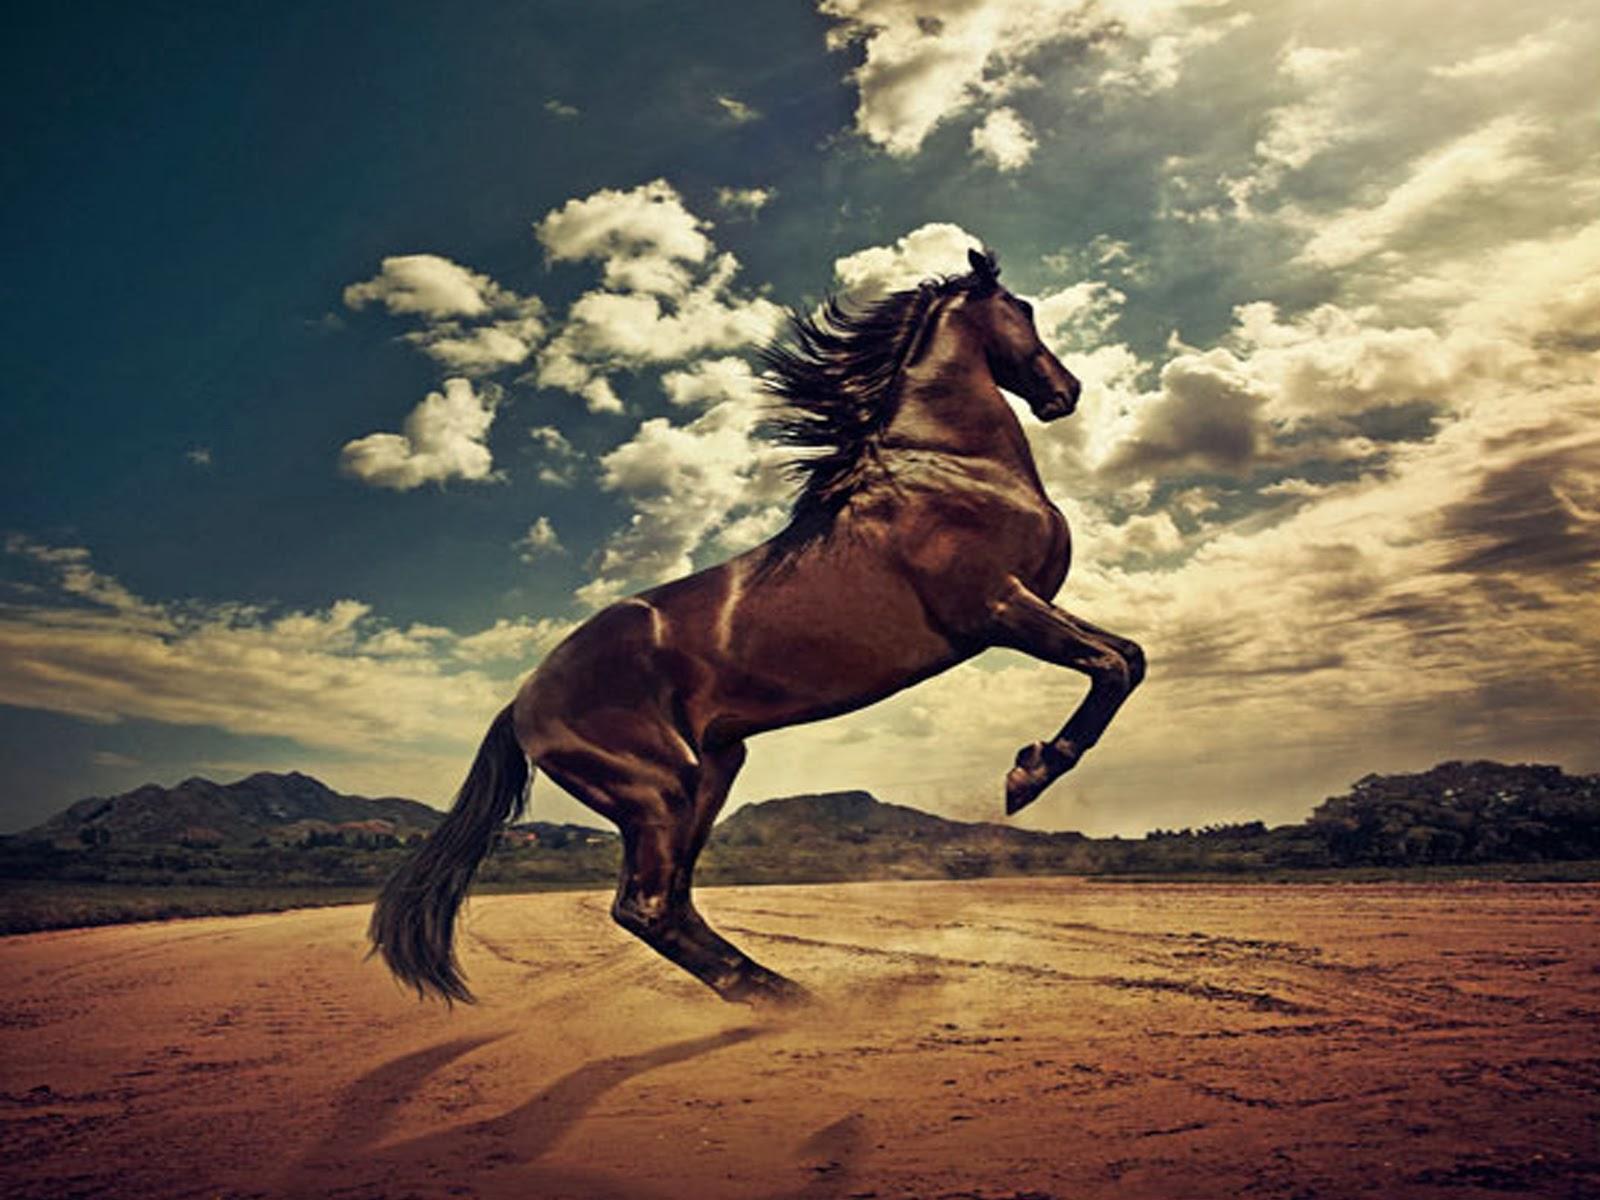 HD wallpapers desktop horse   beautiful desktop wallpapers 2014 1600x1200